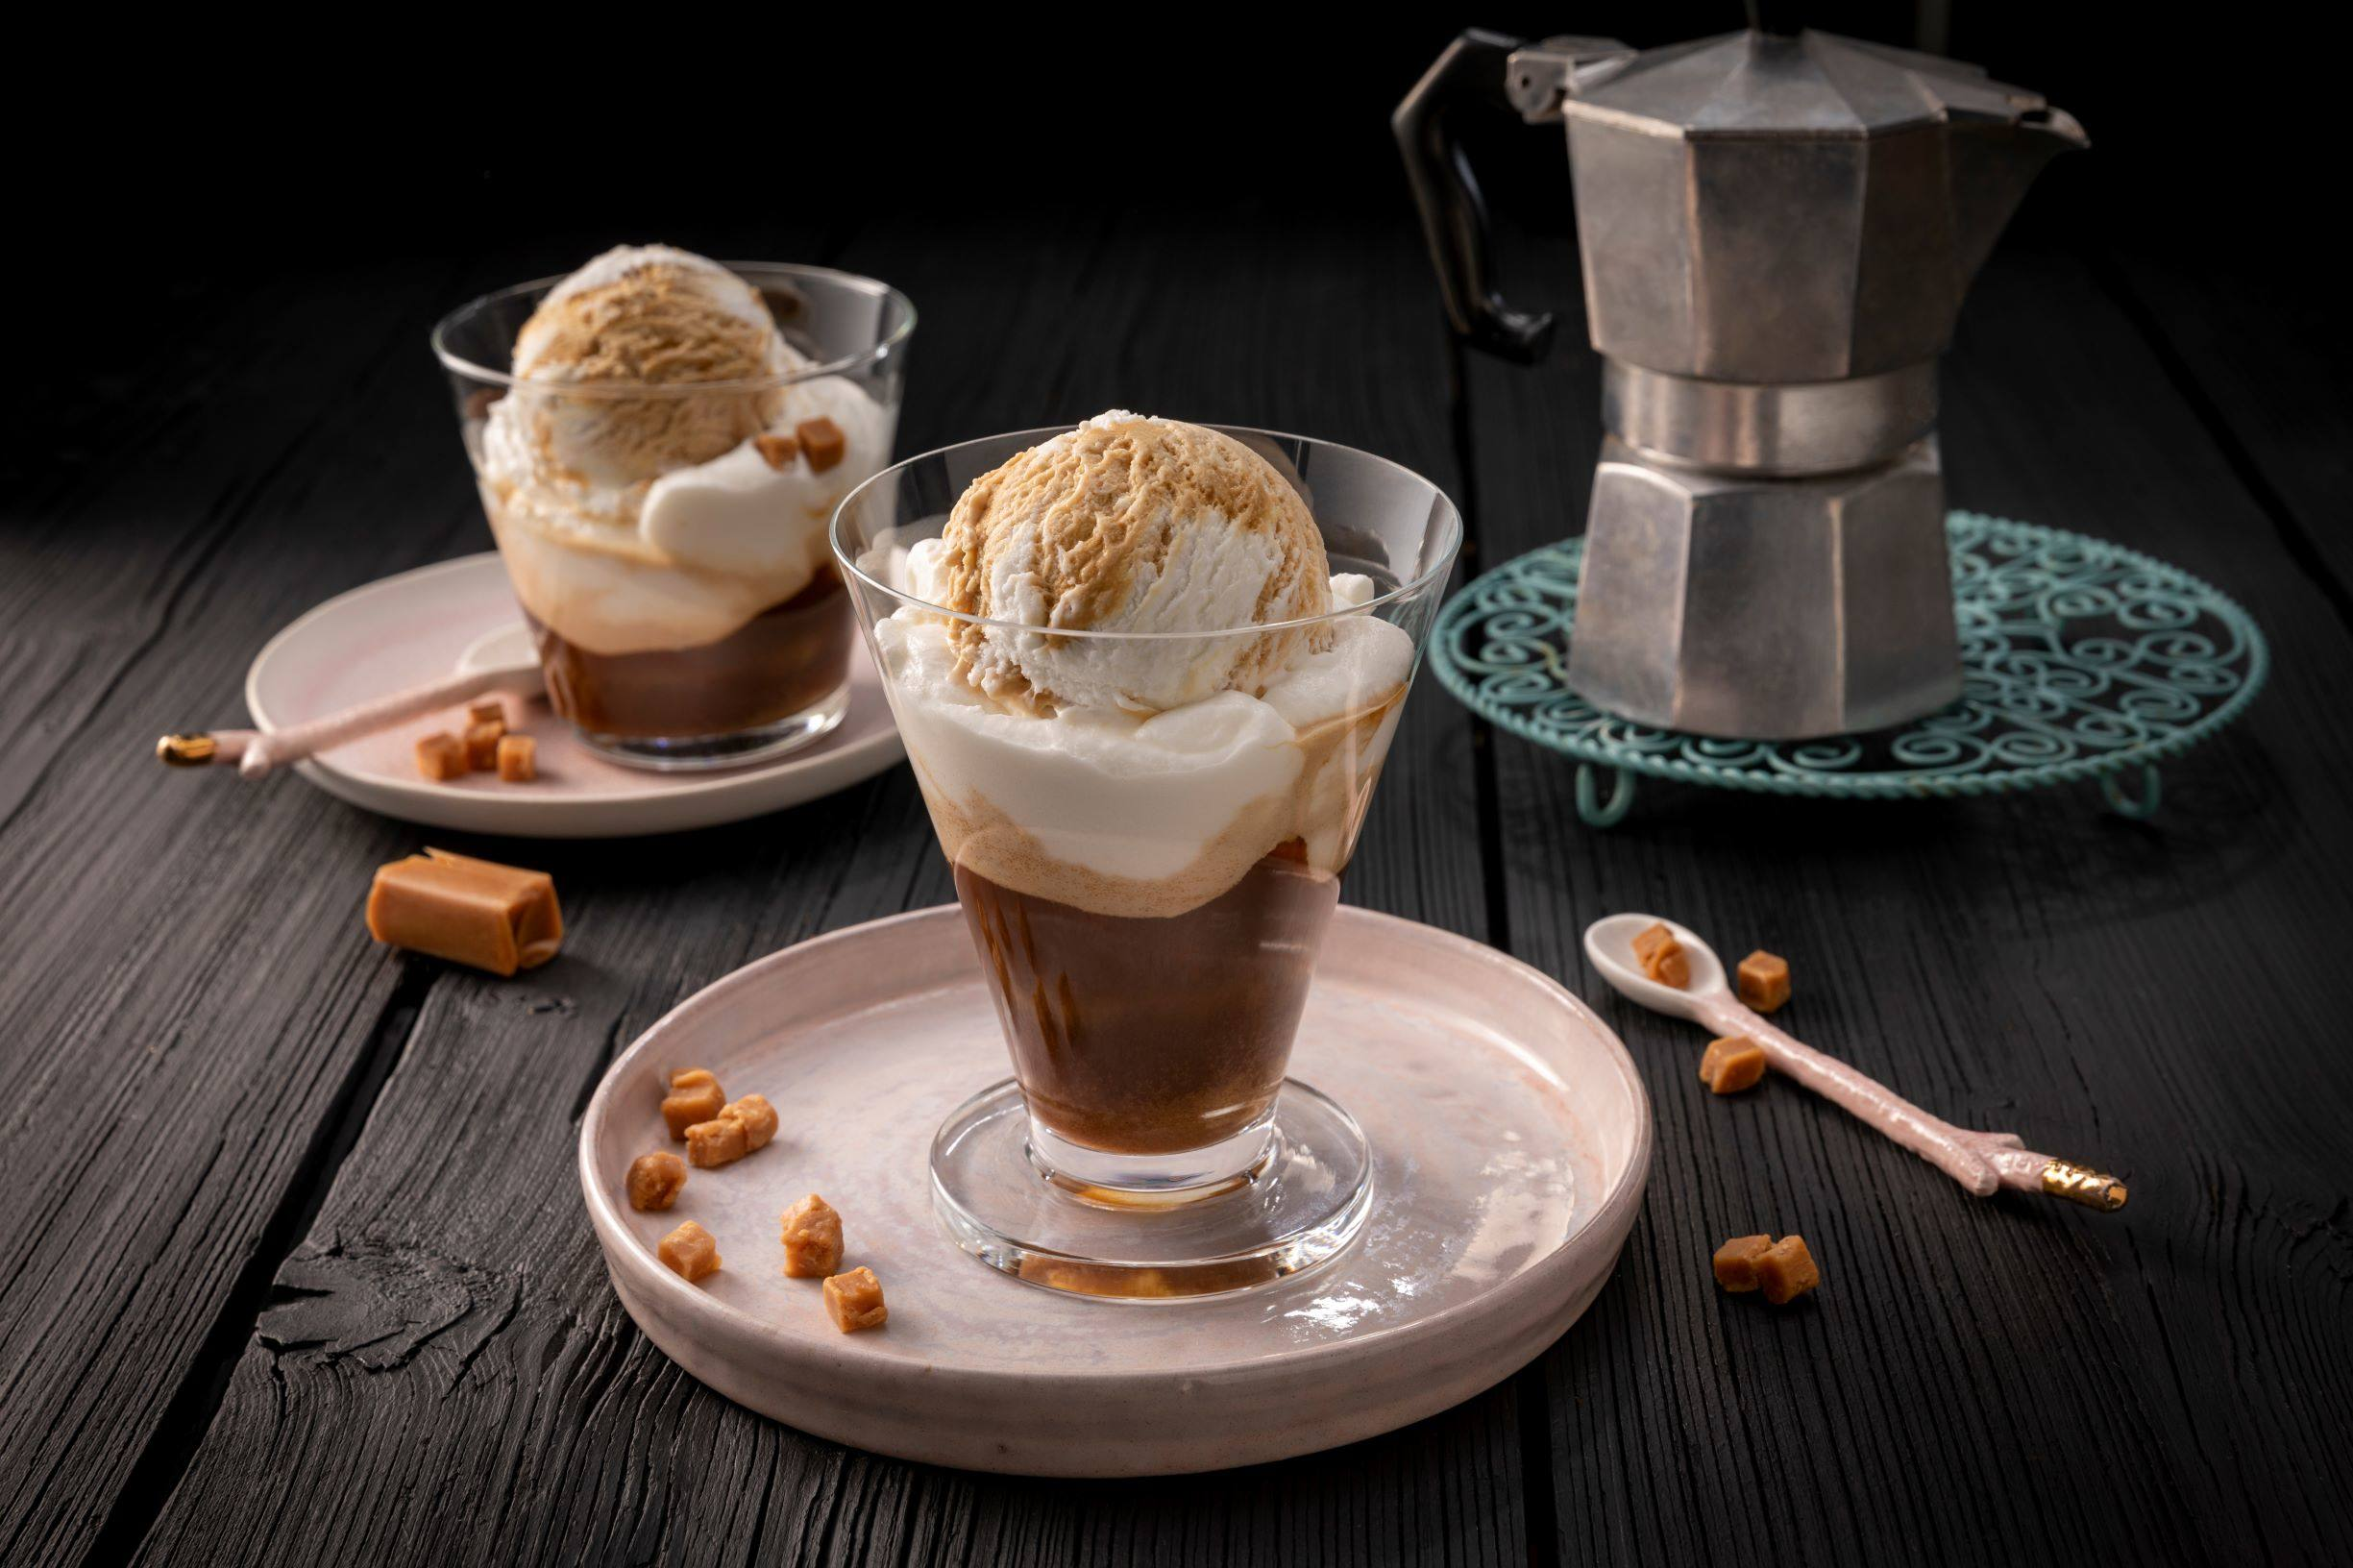 Eiskaffee mit Salted Caramel Eis